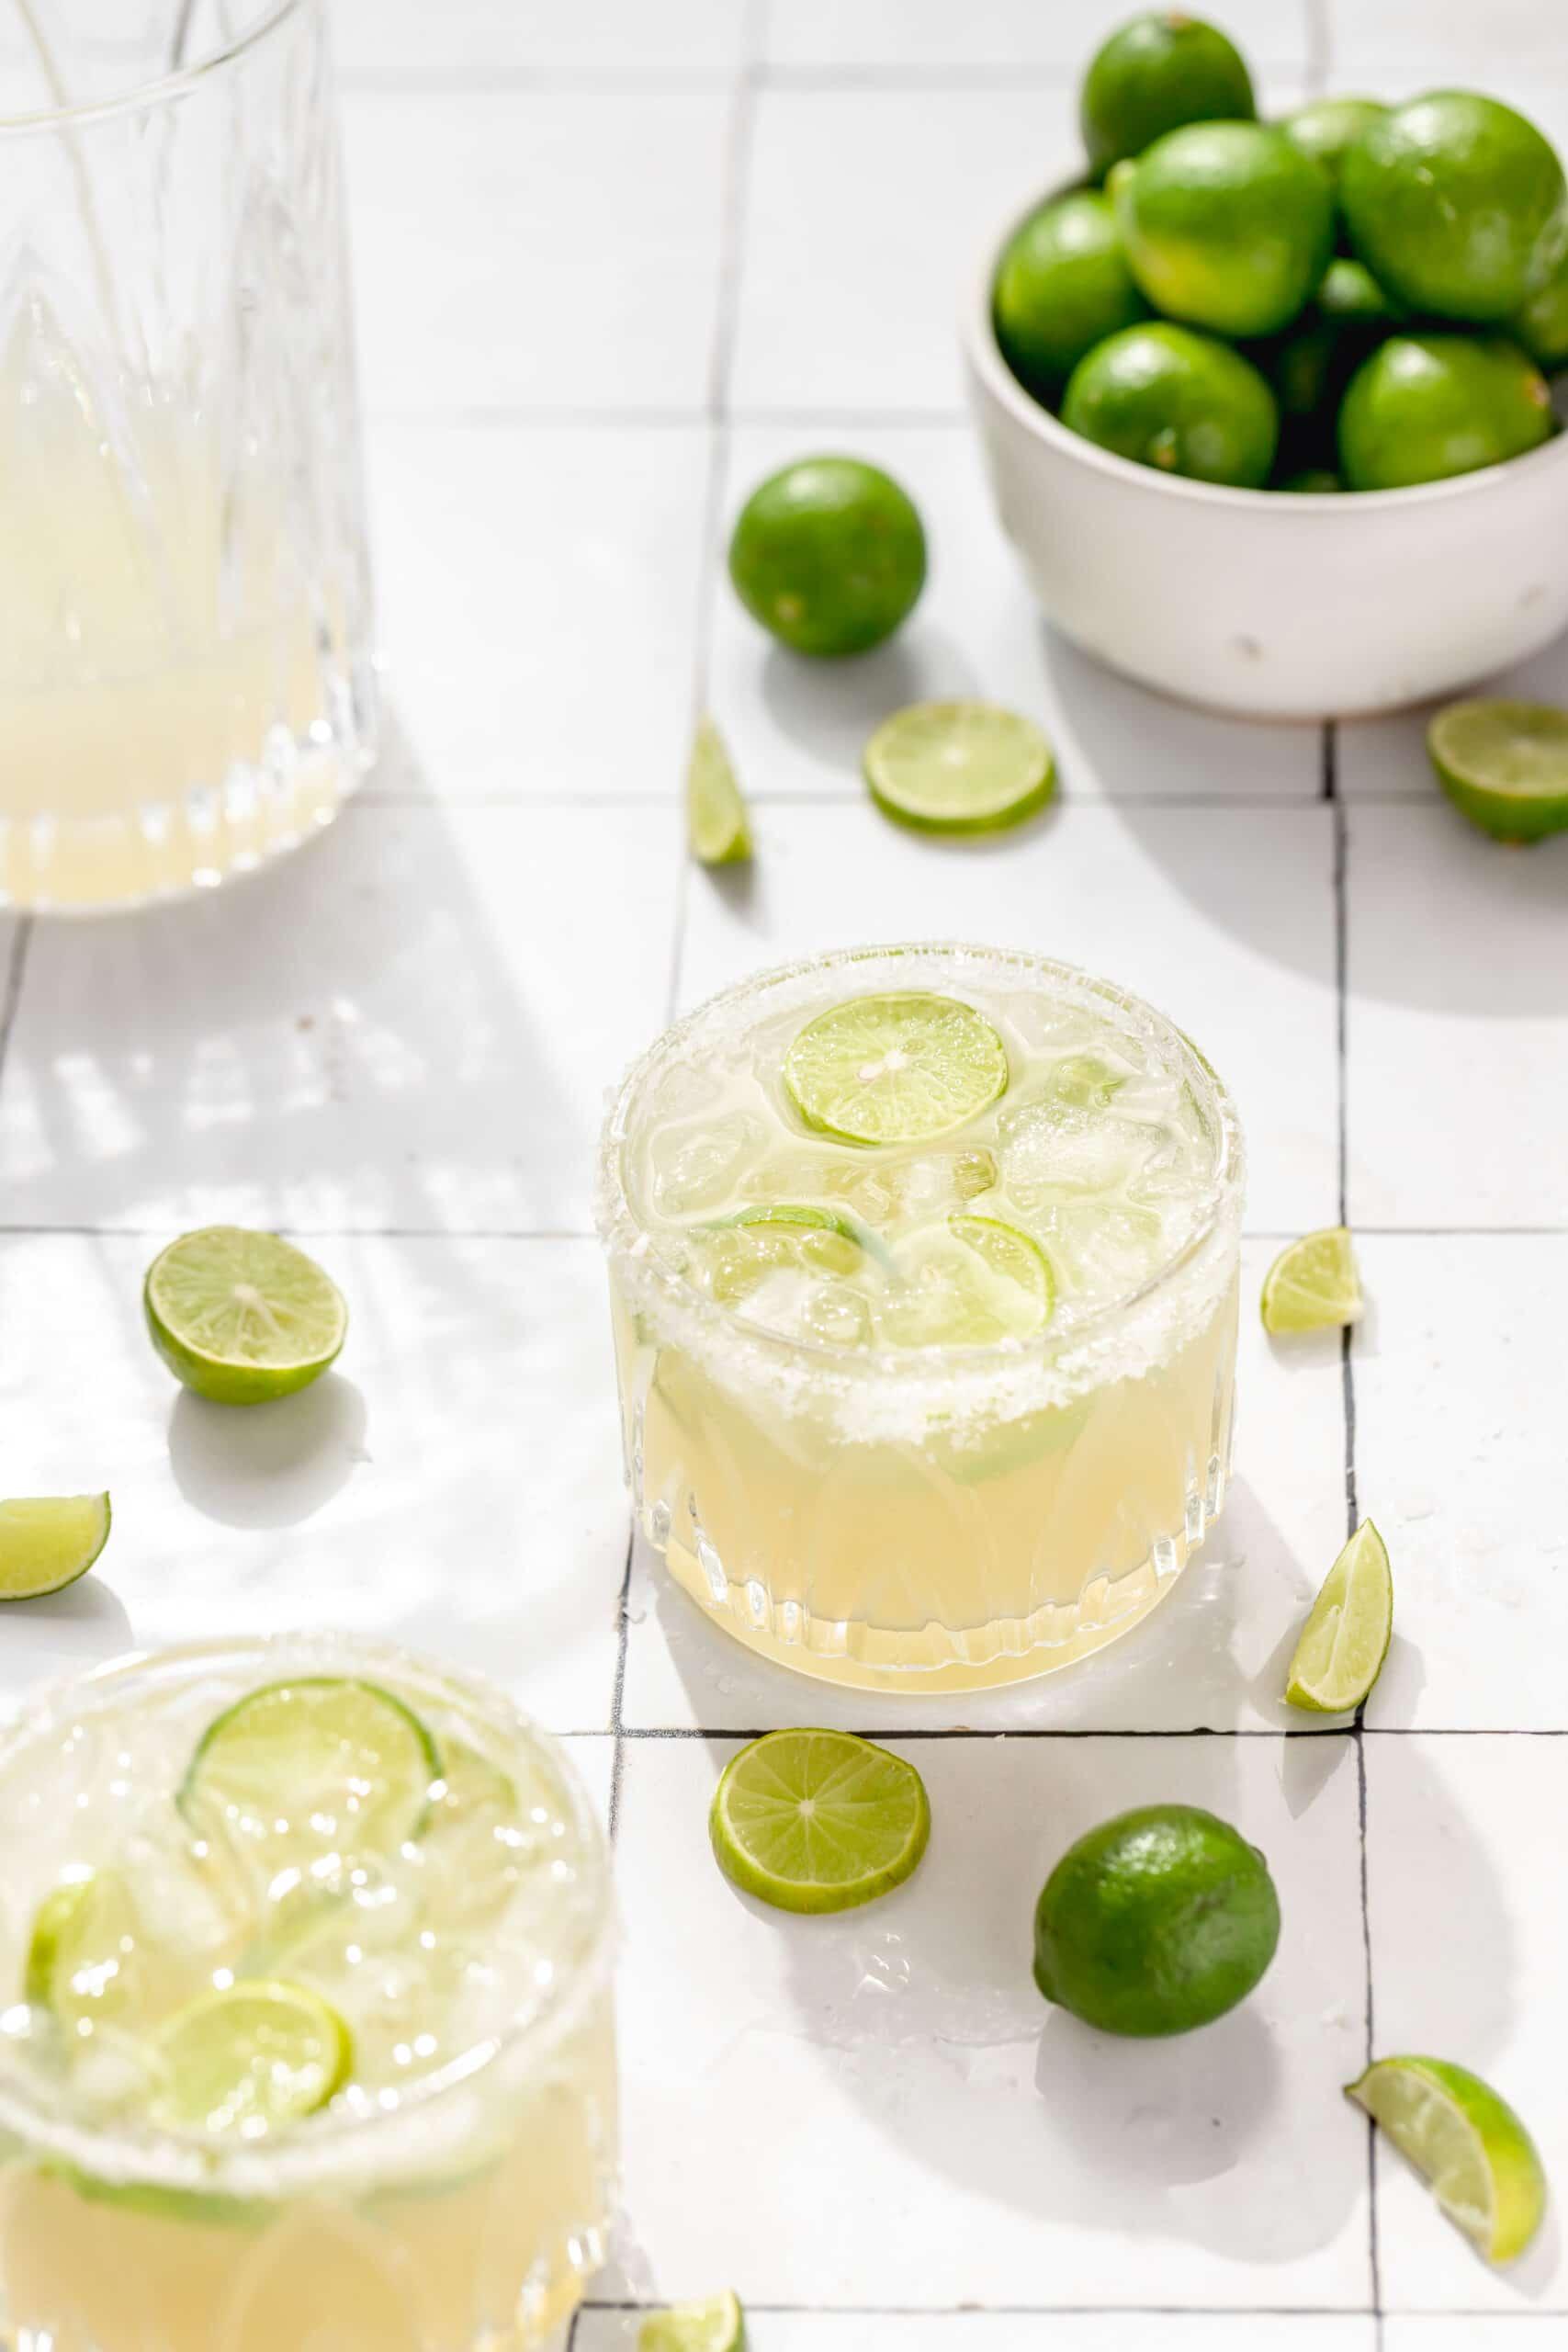 key lime margaritas with sliced key limes